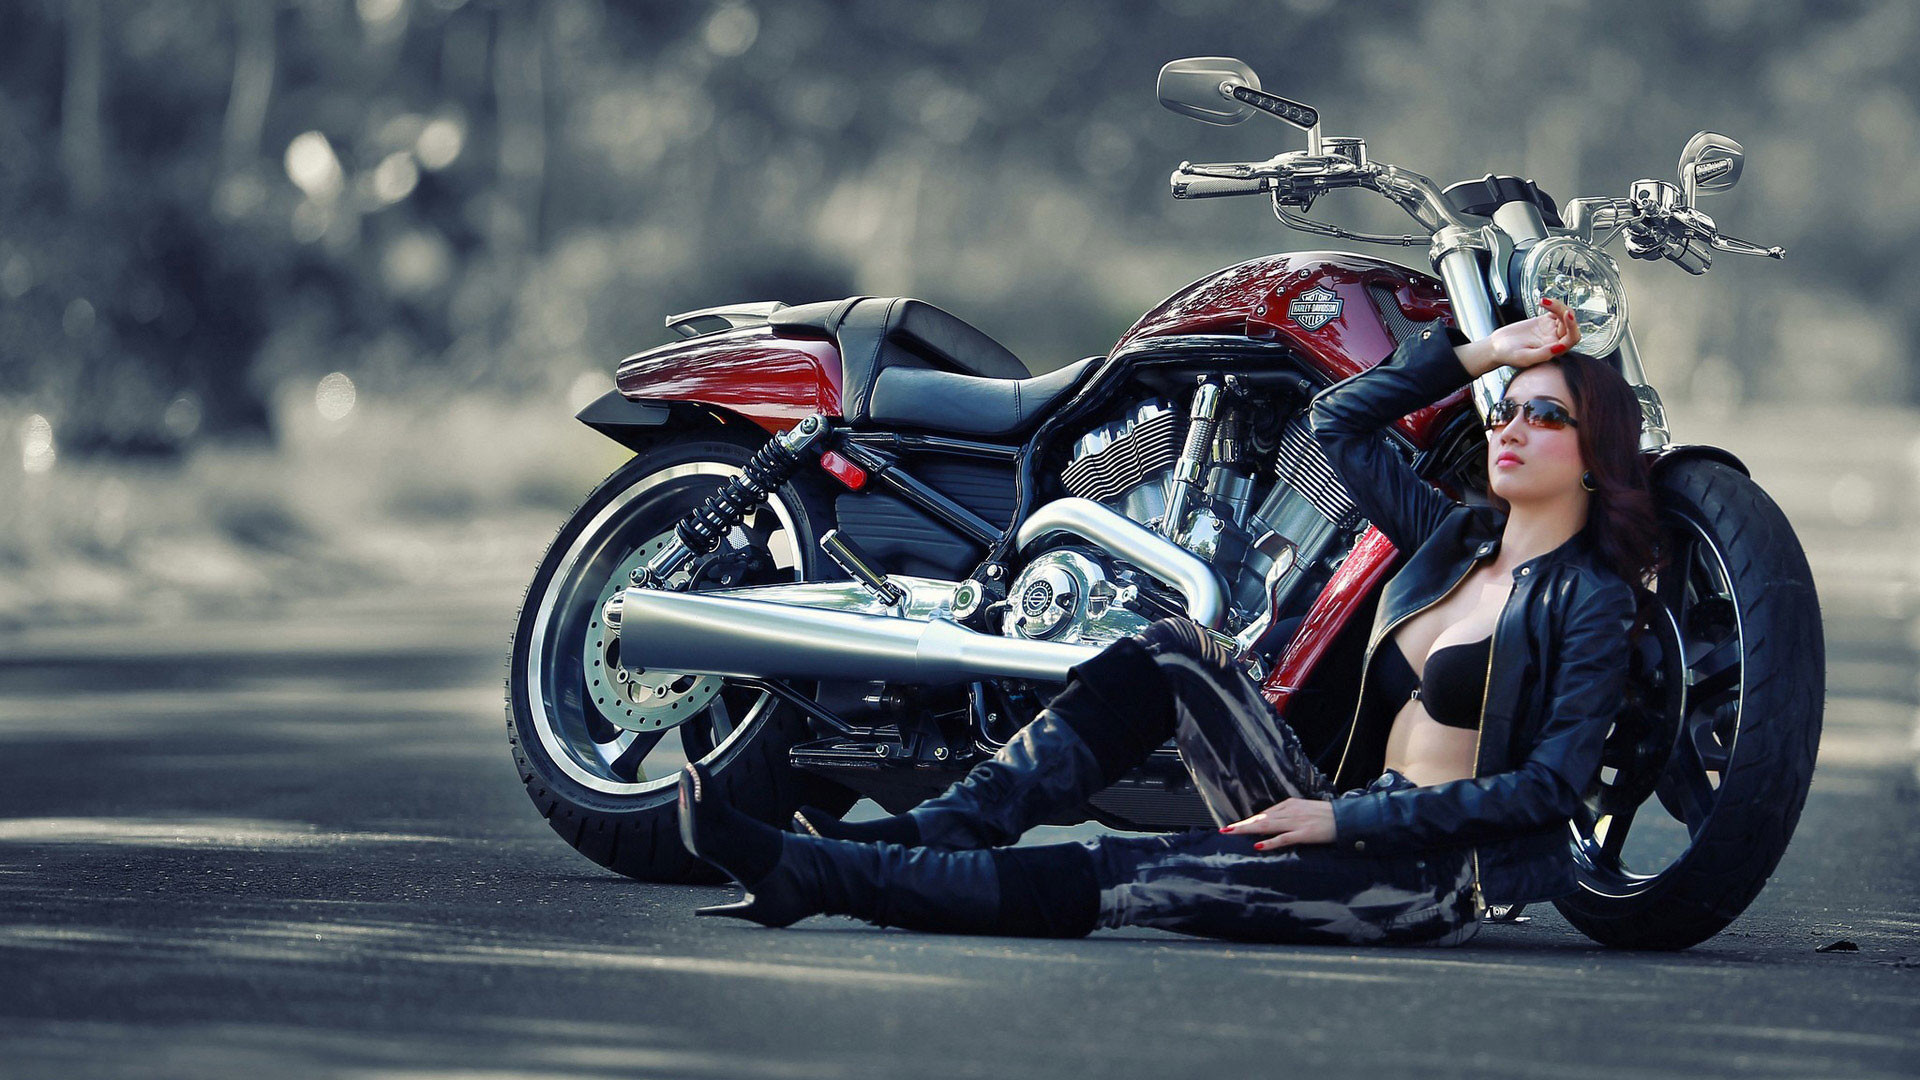 Motorcycle Girl Wallpaper: Girl And Bike Wallpaper (77+ Images